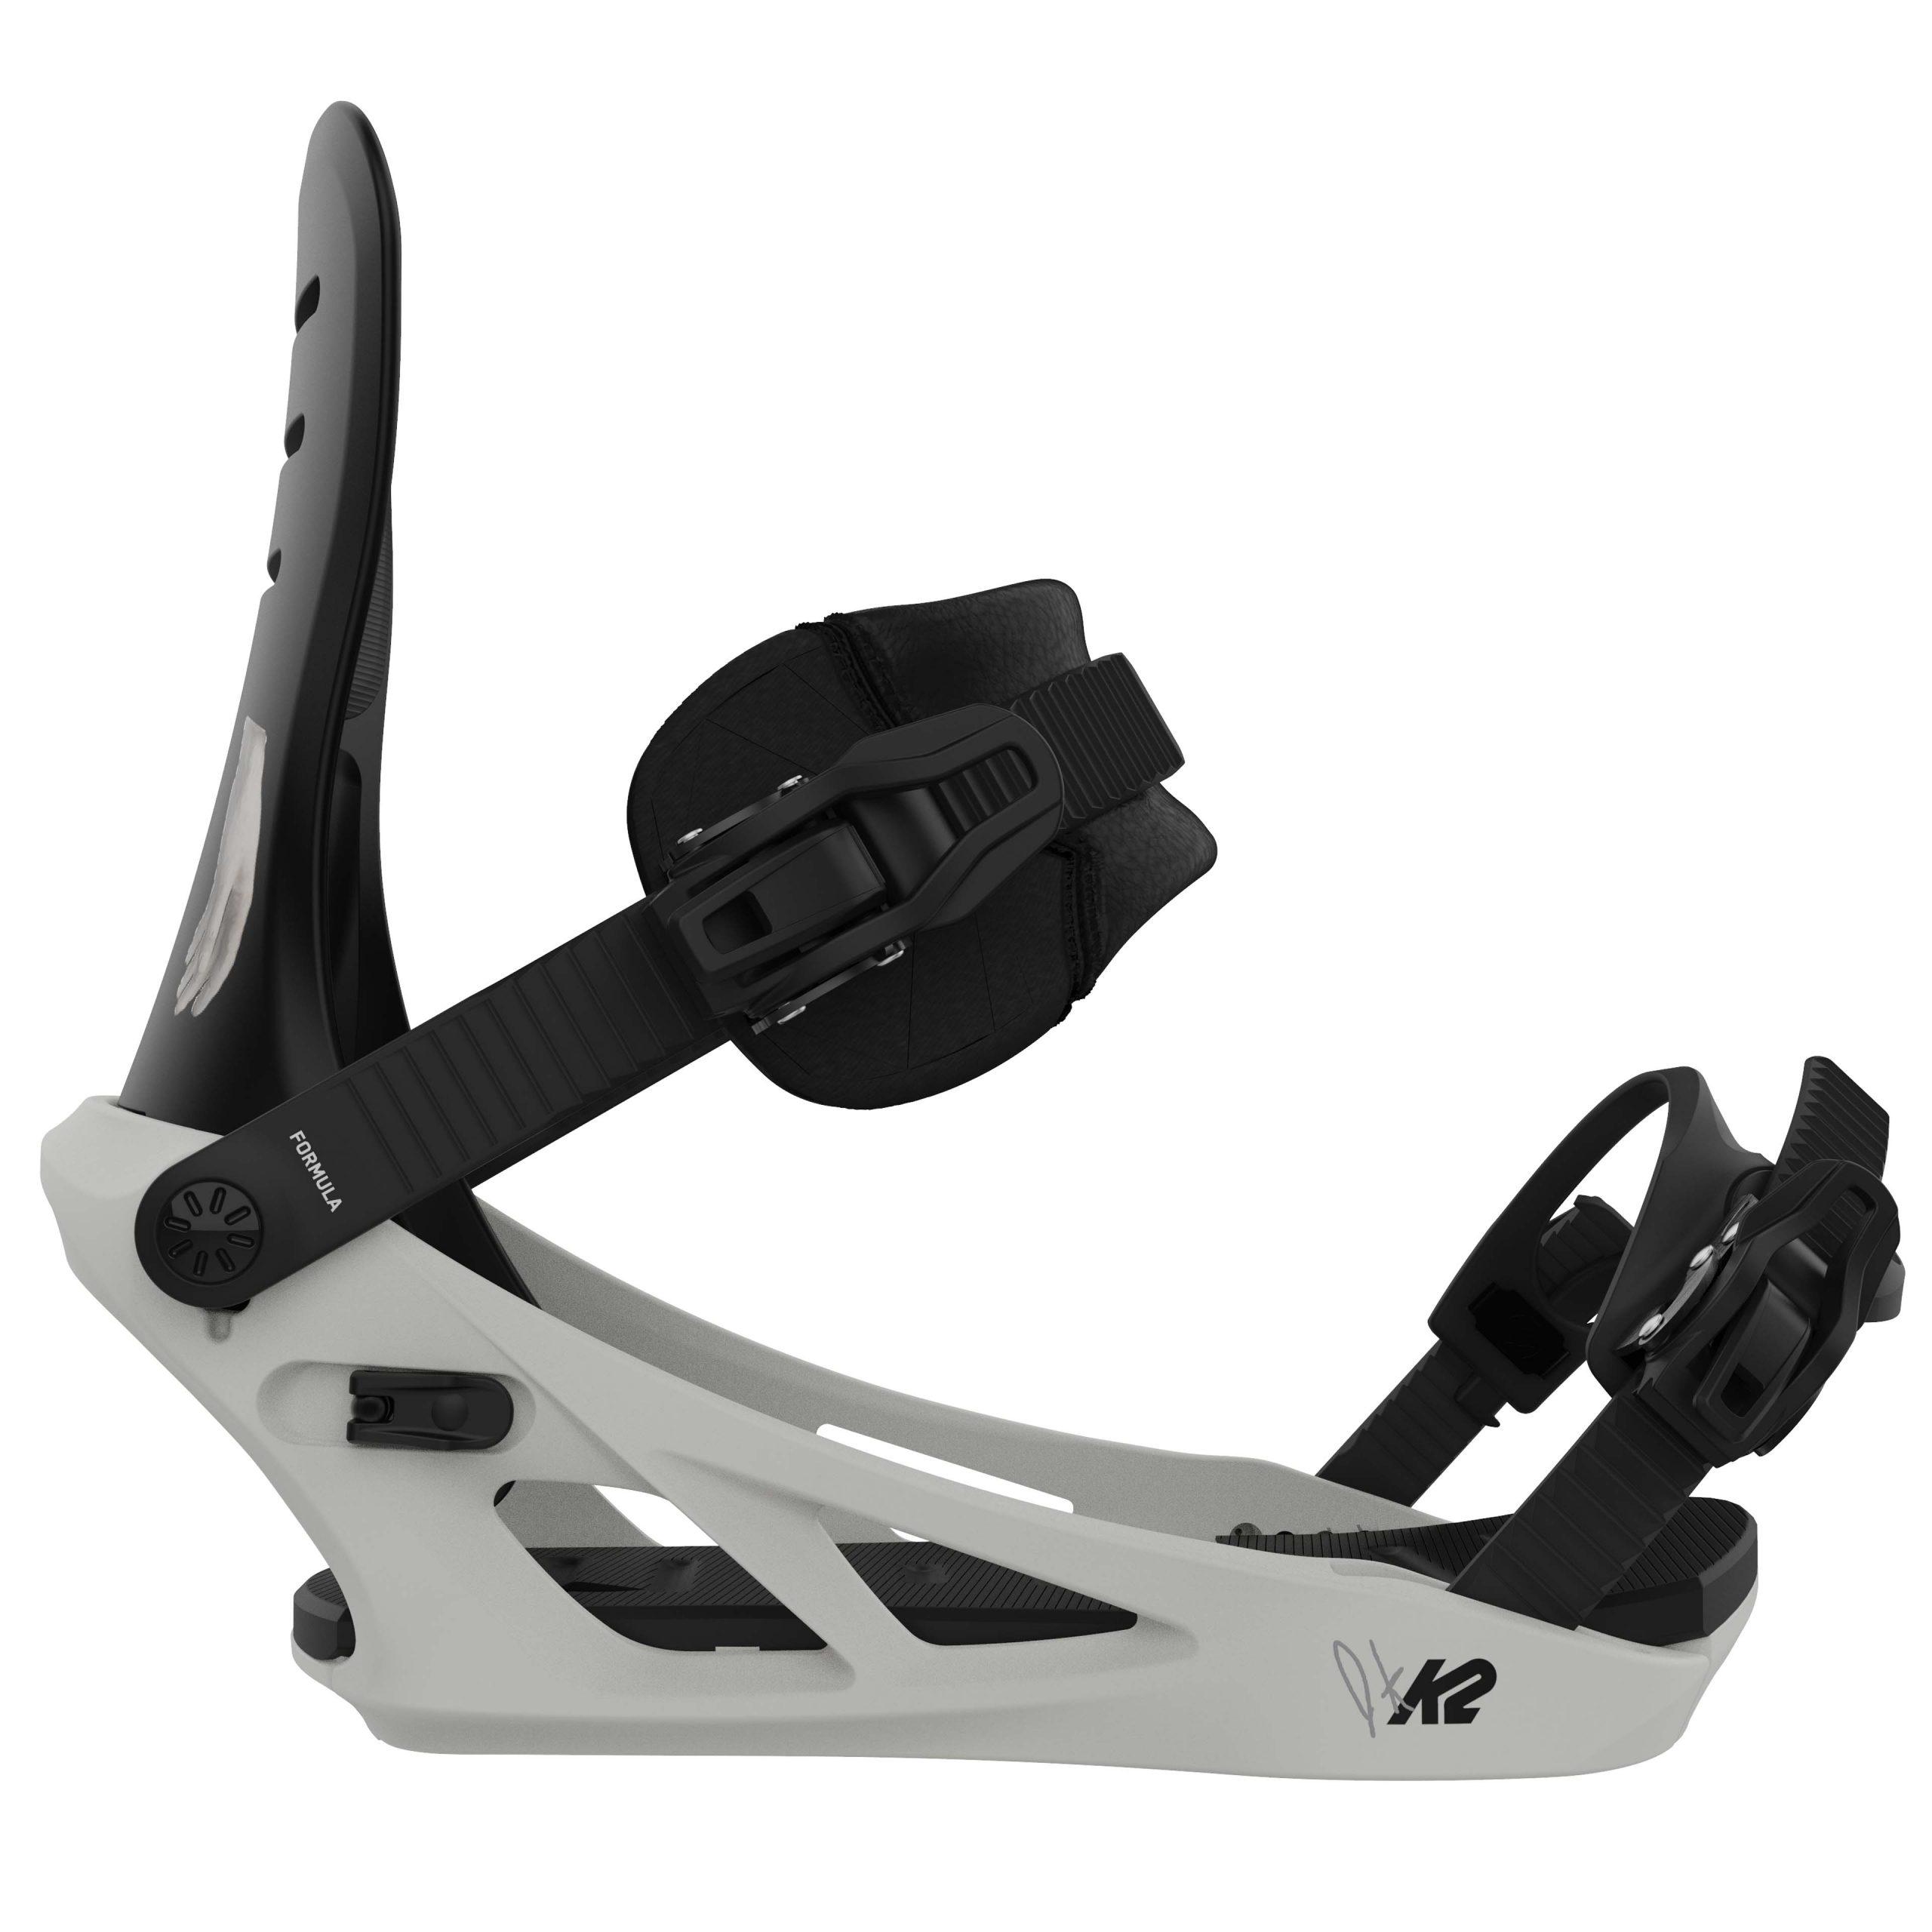 K2 21/22 Snowboard Bindings